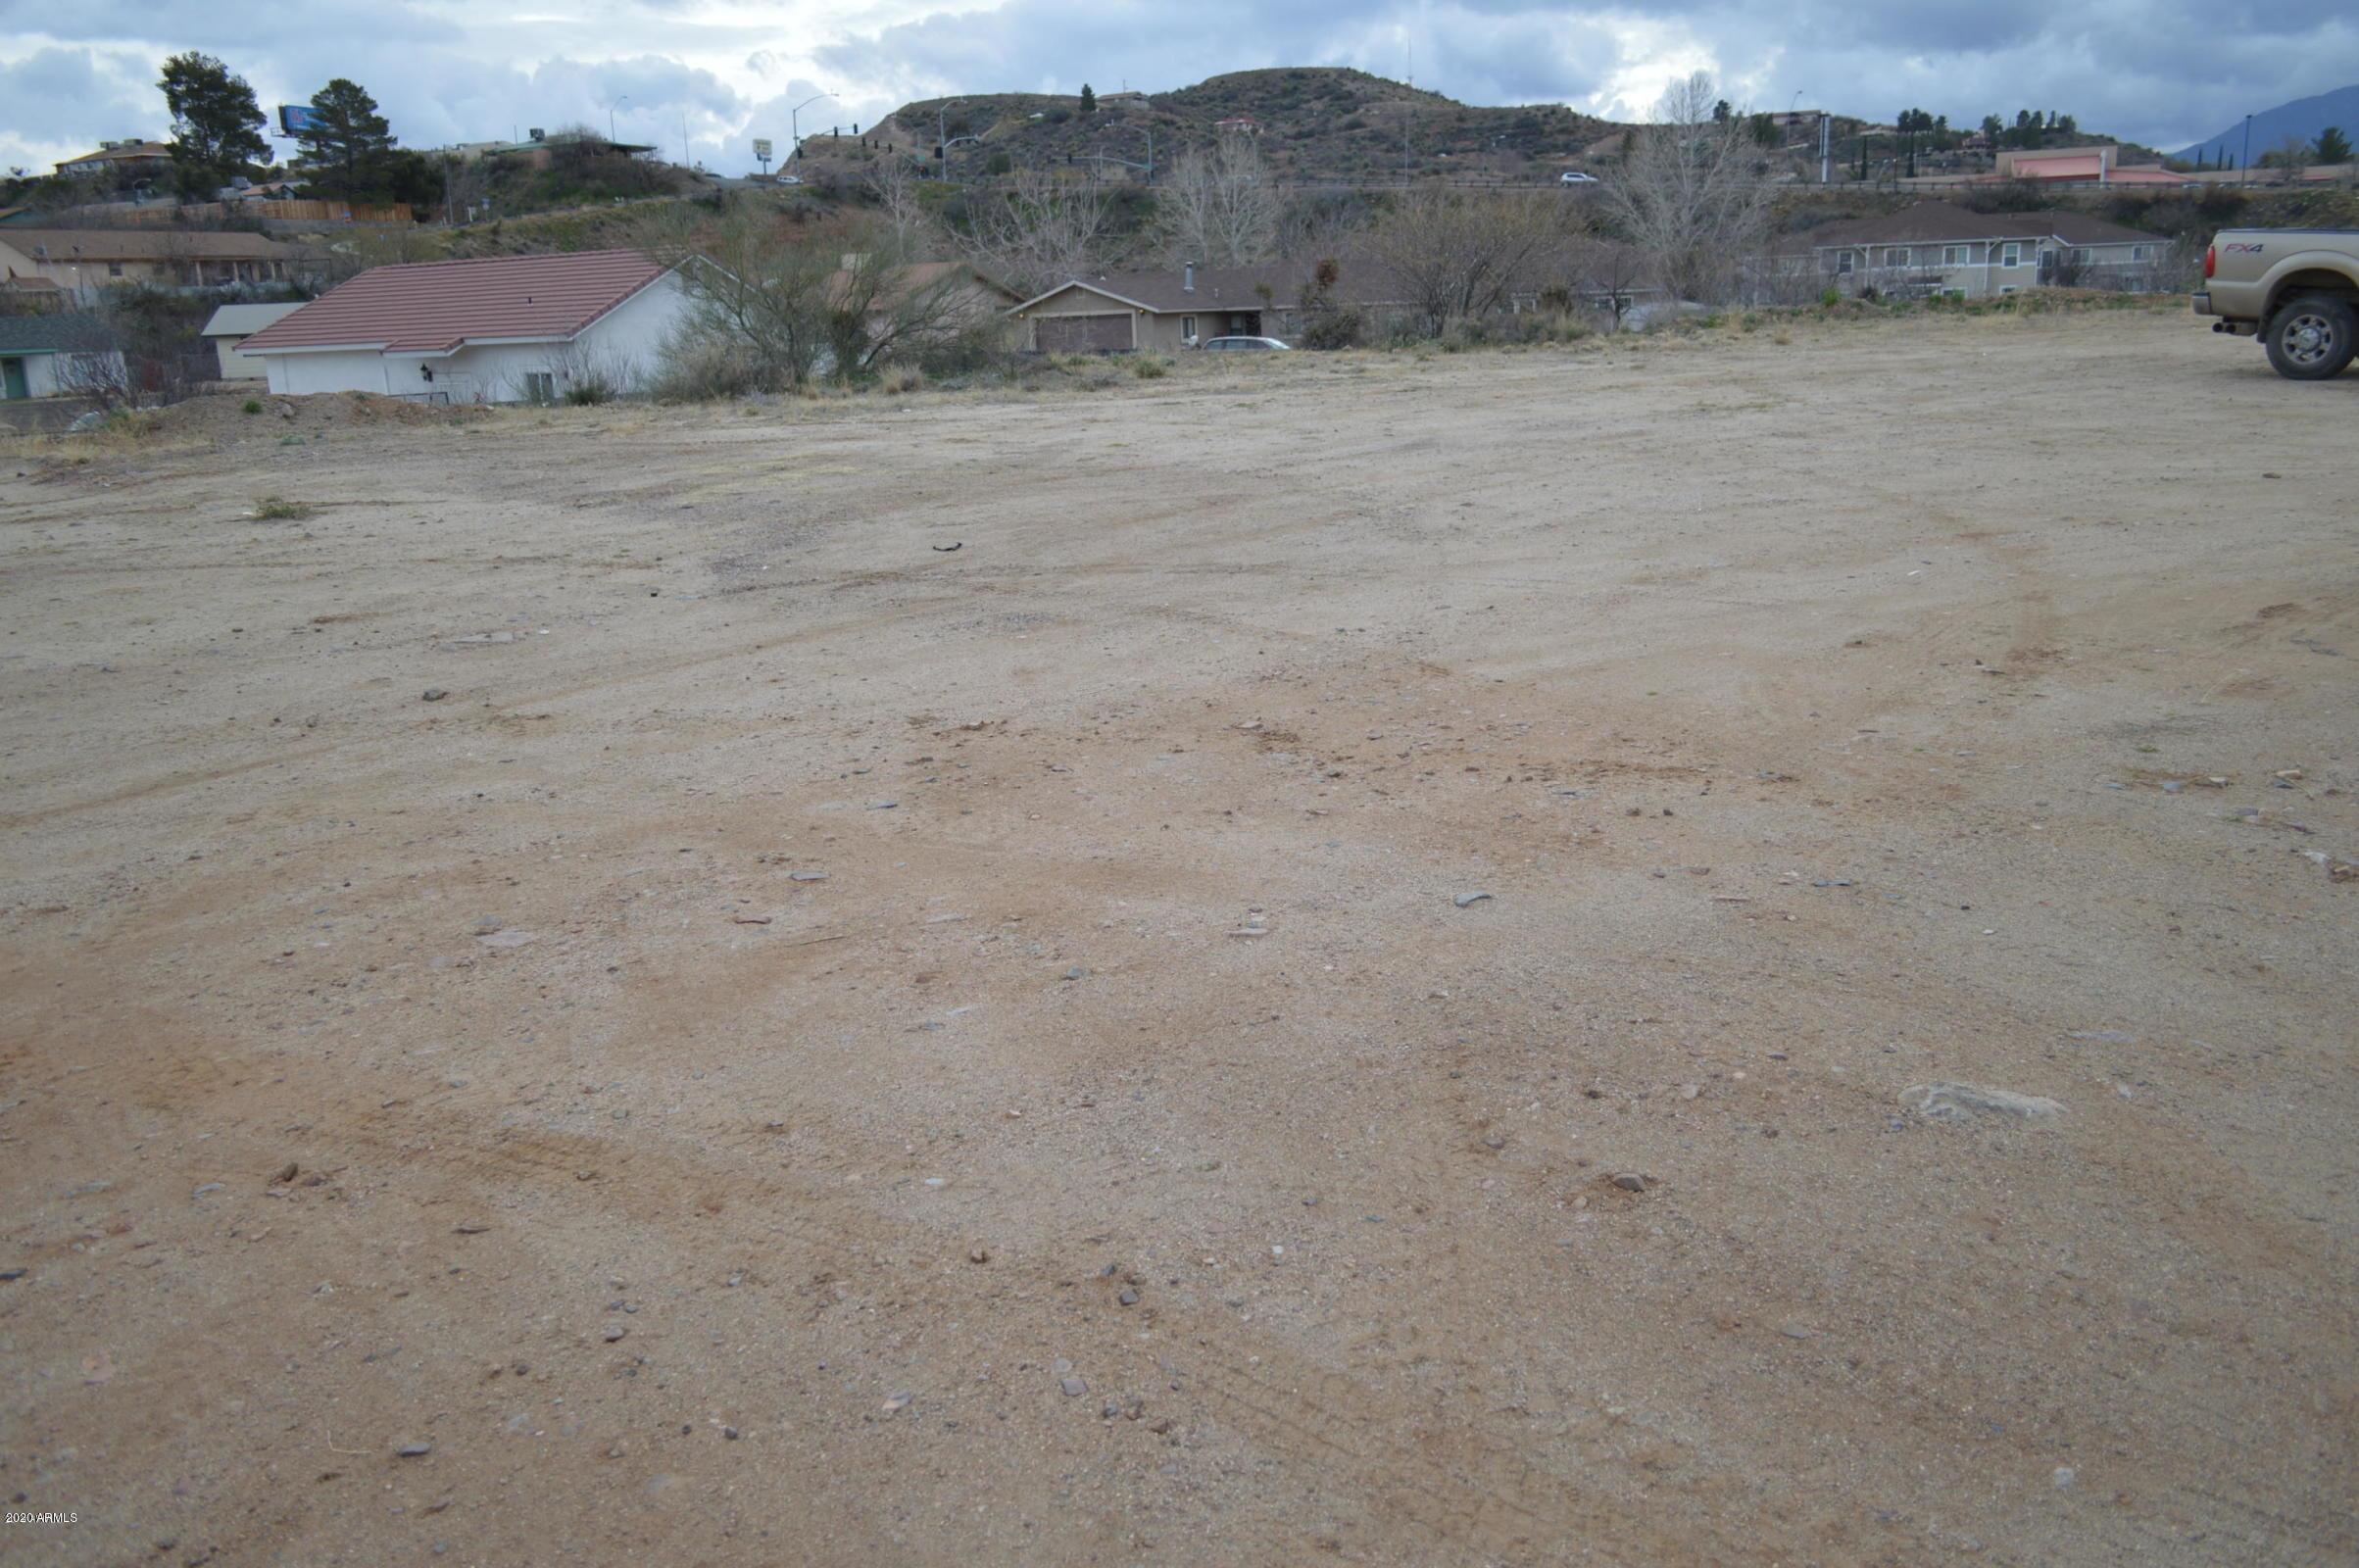 Lot 106 N Pinaleno Pass Road # 106, Globe, Arizona 85501, ,Land,For Sale,Lot 106 N Pinaleno Pass Road # 106,6019241